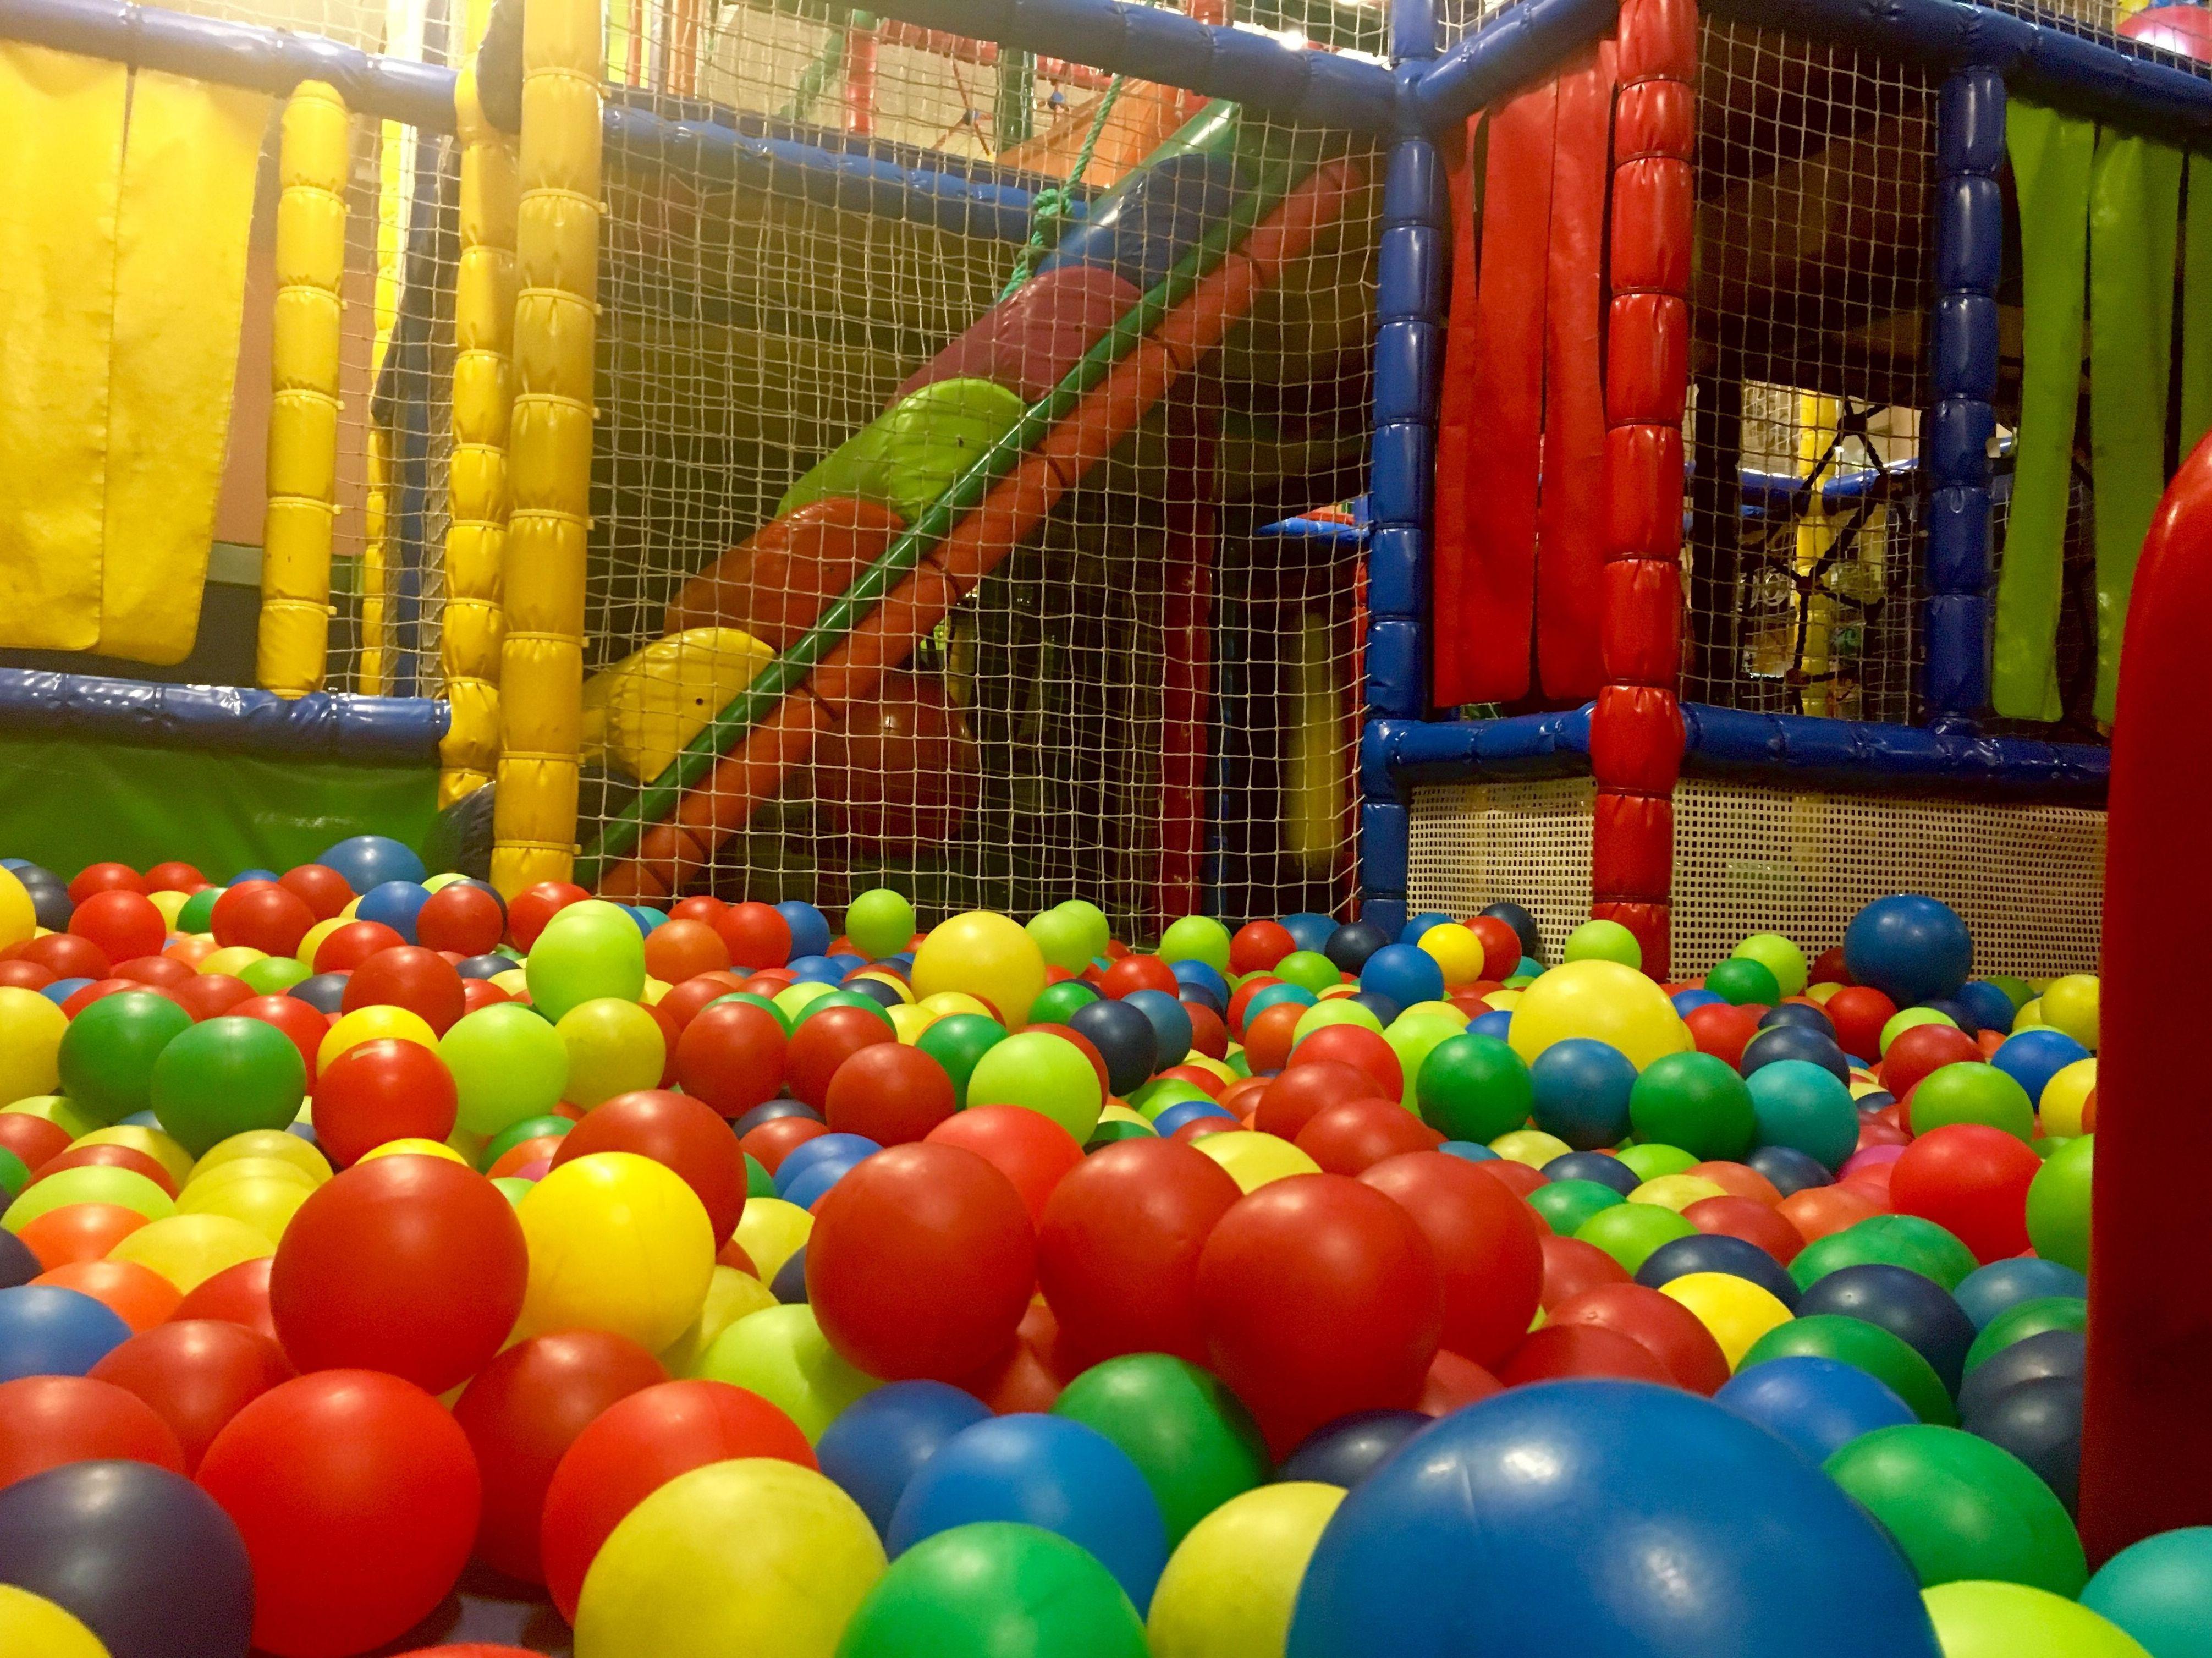 Parques de bolas en madrid centro al trote parque infantil for Bolas piscinas infantiles